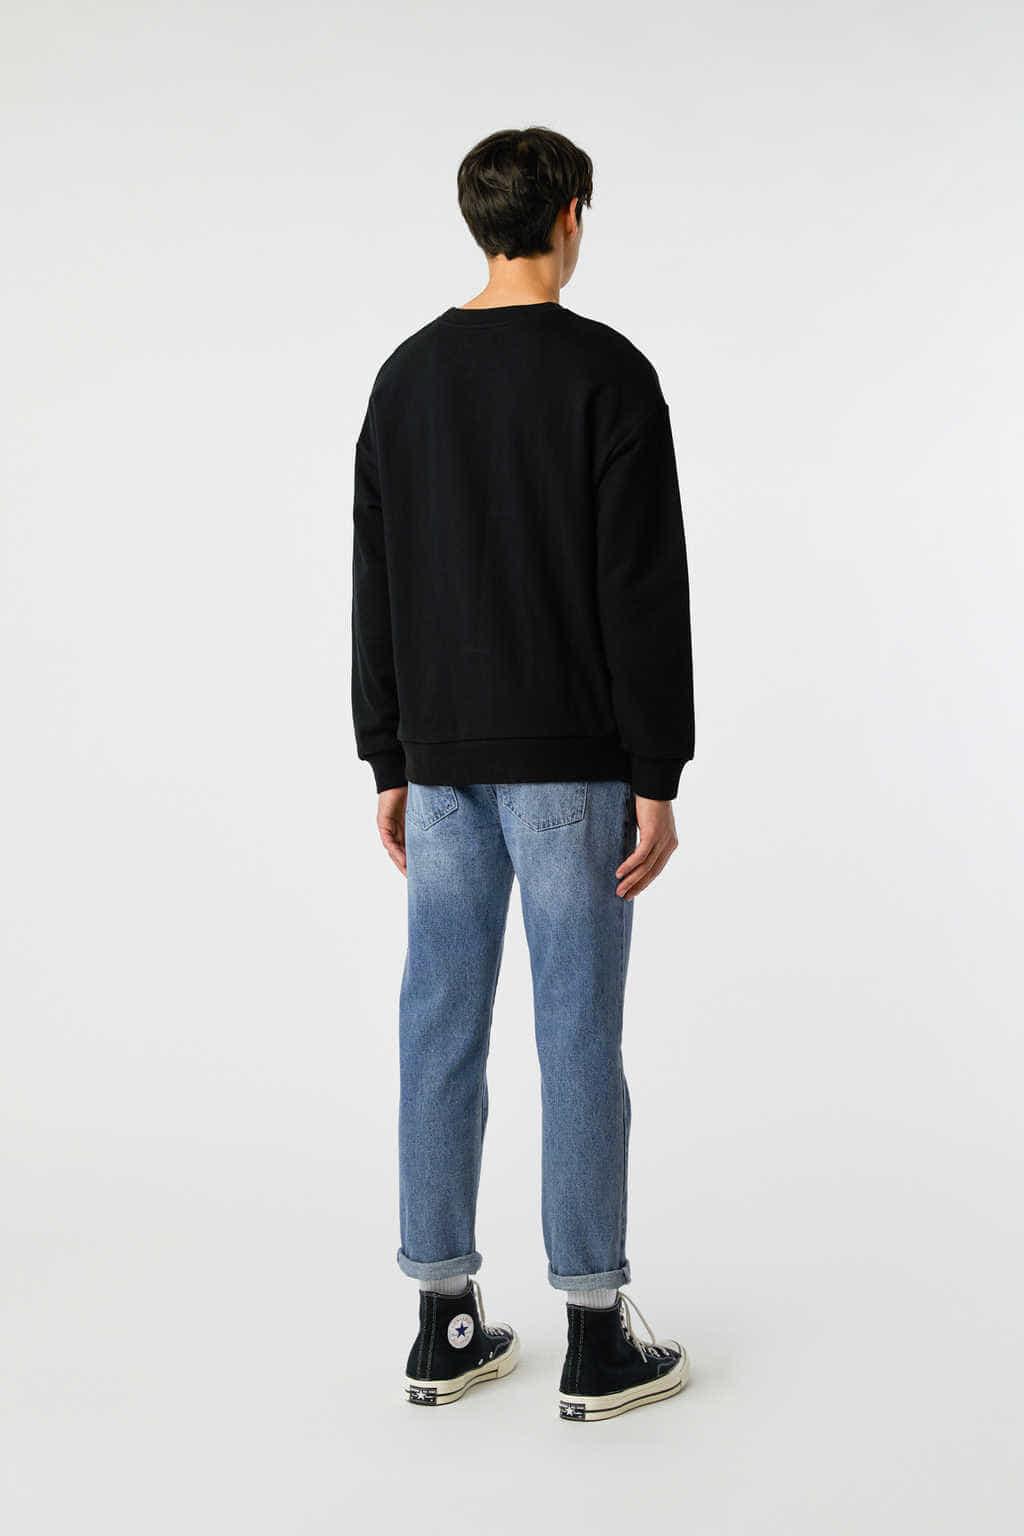 Sweatshirt 3138 Black 16